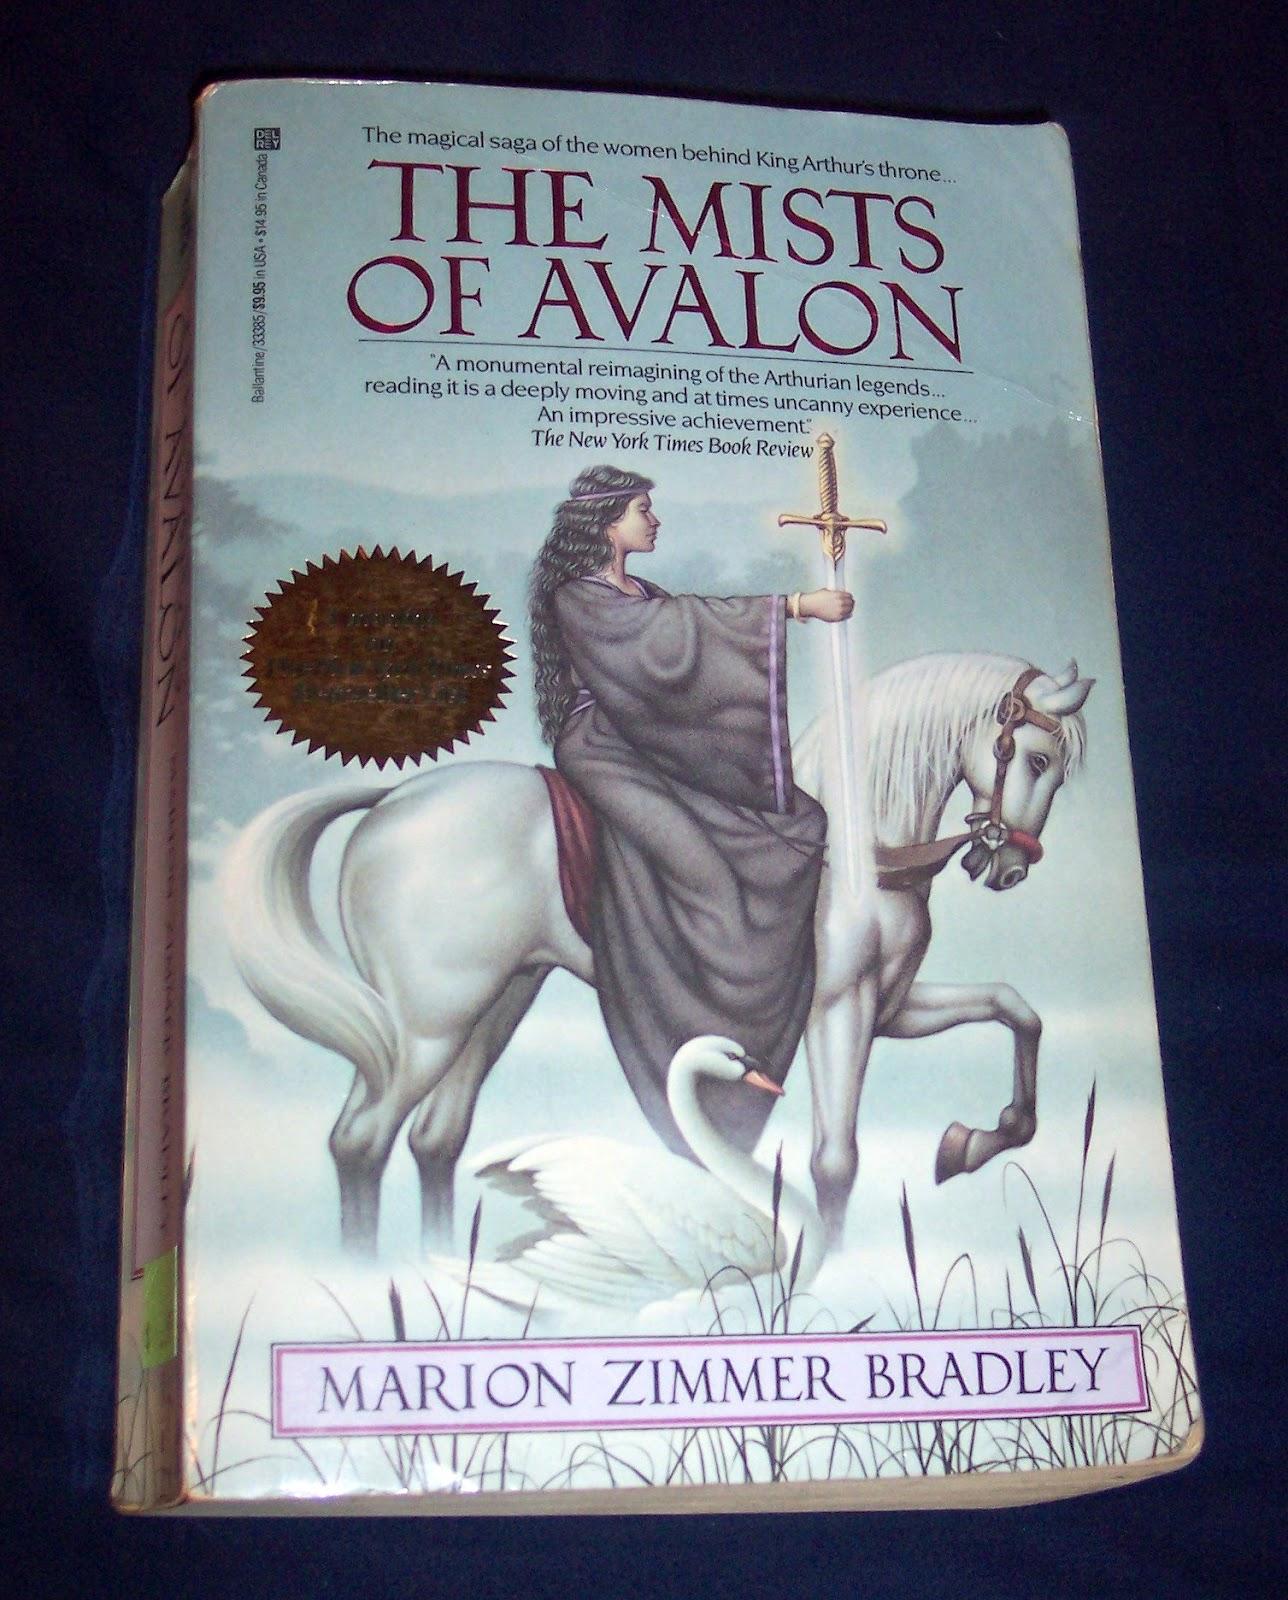 The Mists of Avalon Analysis